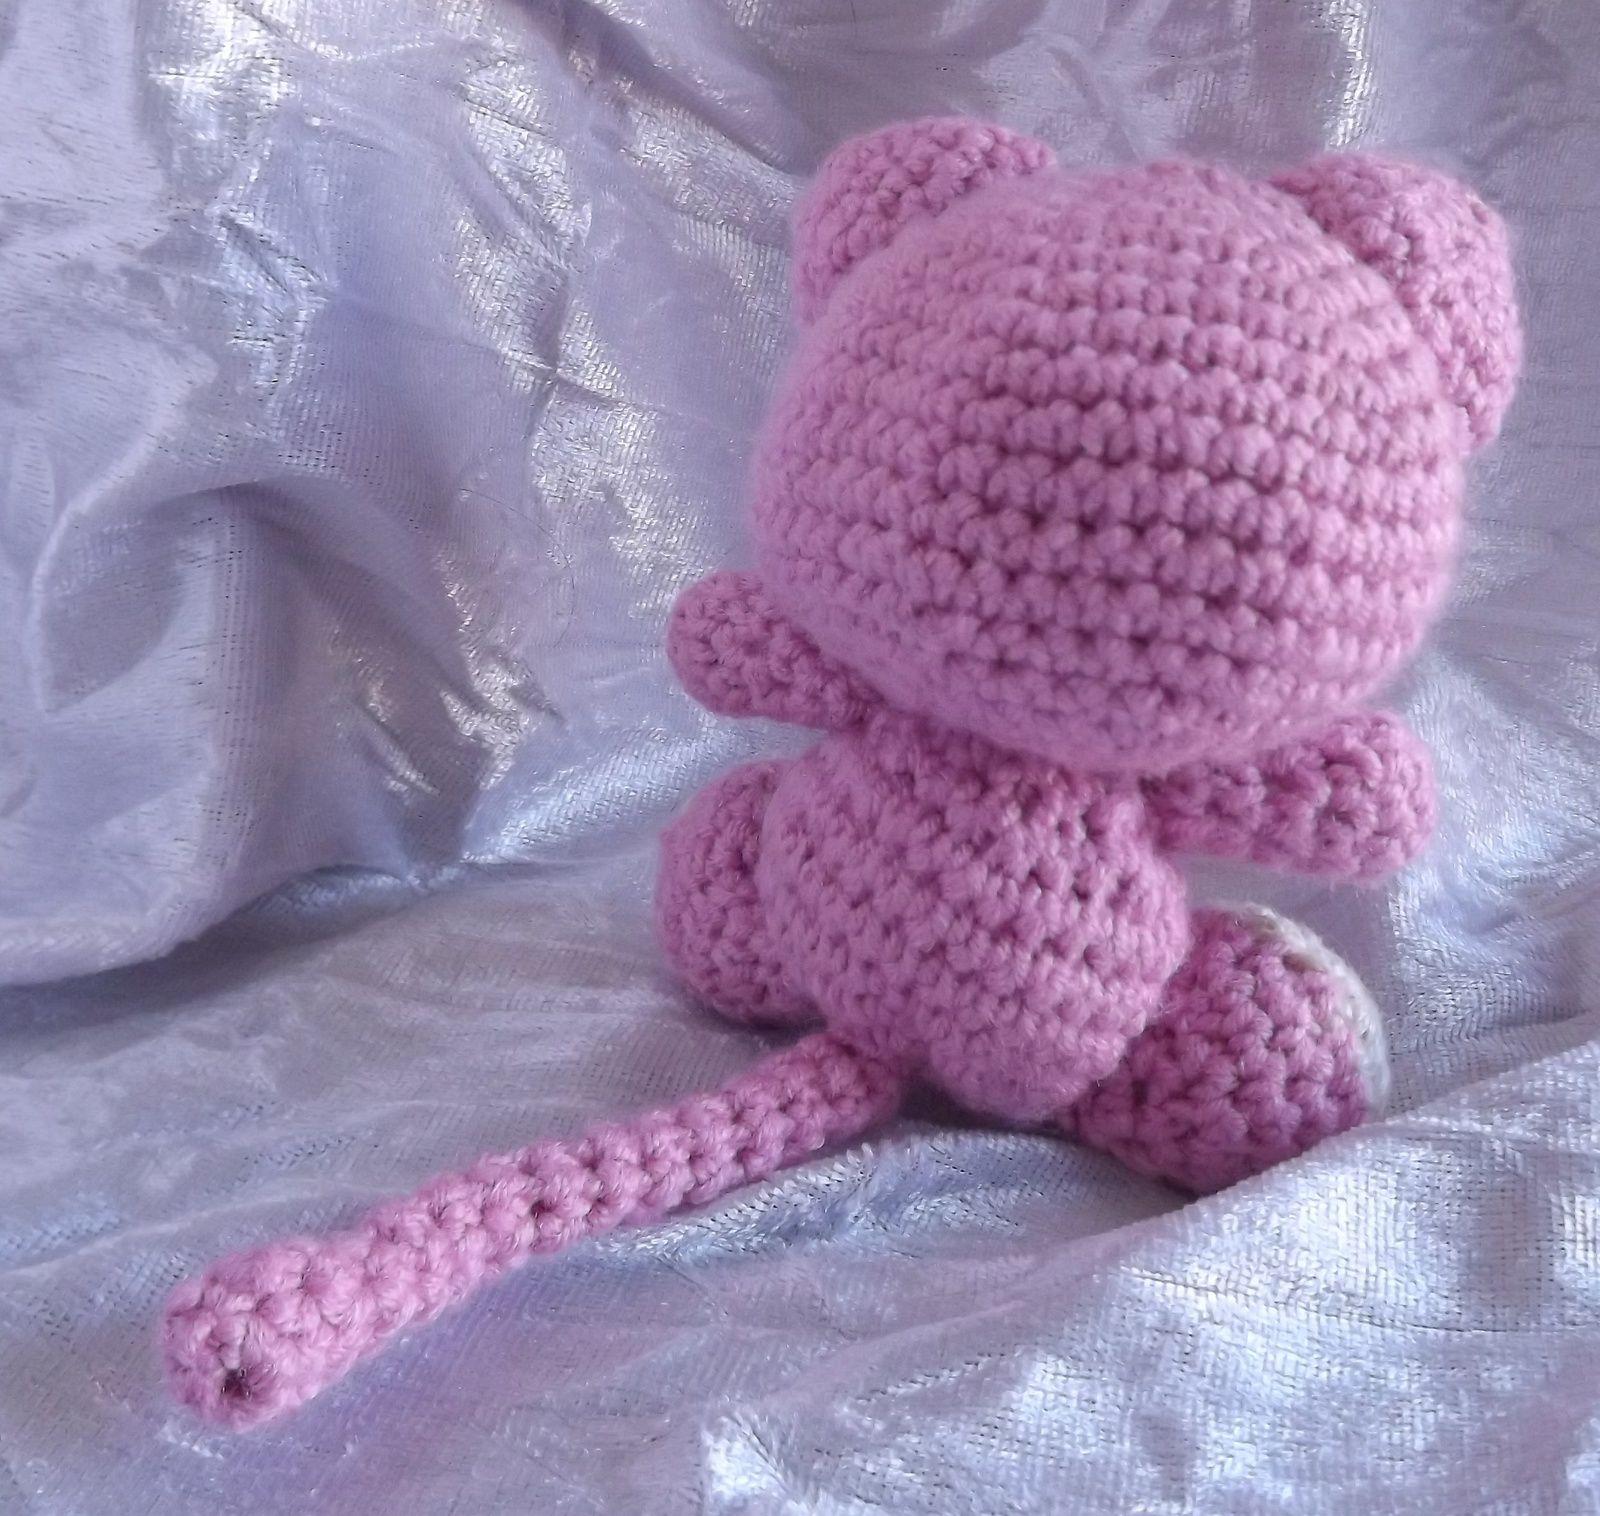 amigurumis-petits animaux au crochet